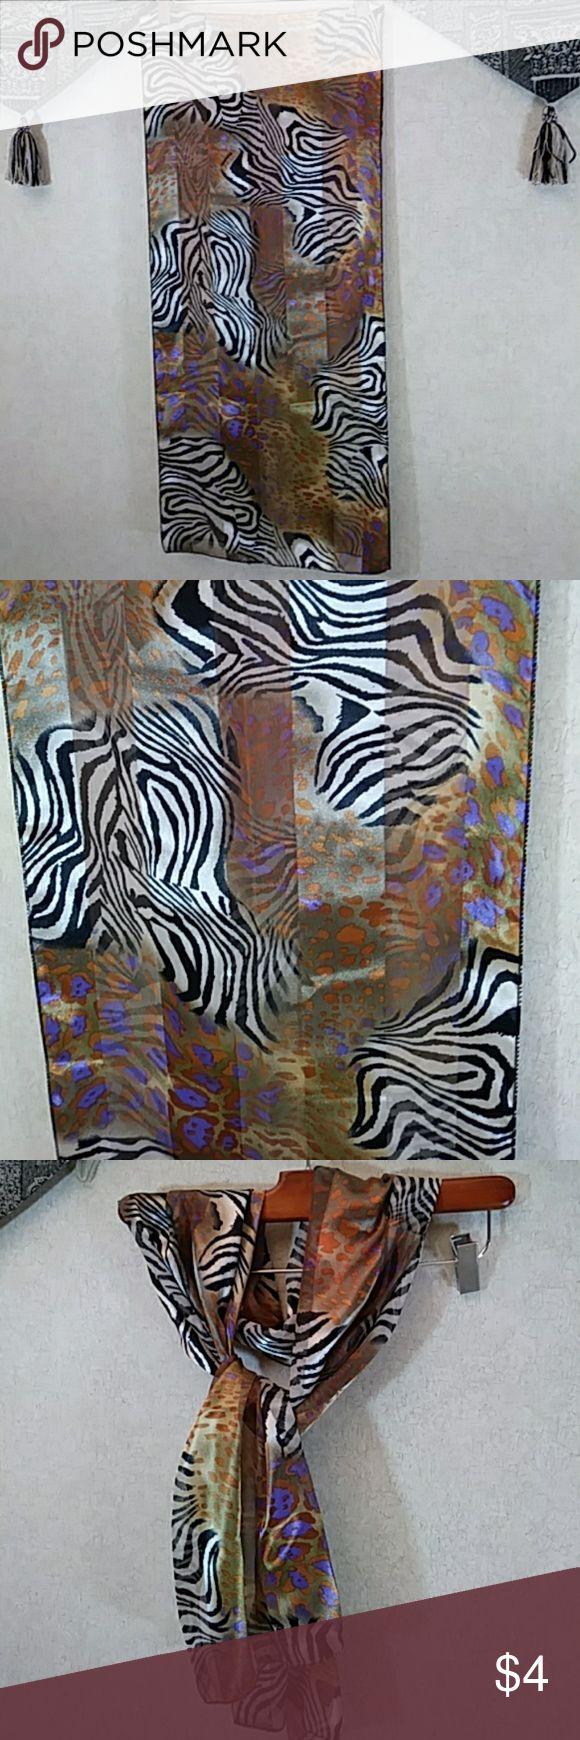 "Zebra print scarf So versatile! Black, cream, gold, purple, burnt orange. 100% polyester. 13"" x 60"" Accessories Scarves & Wraps"